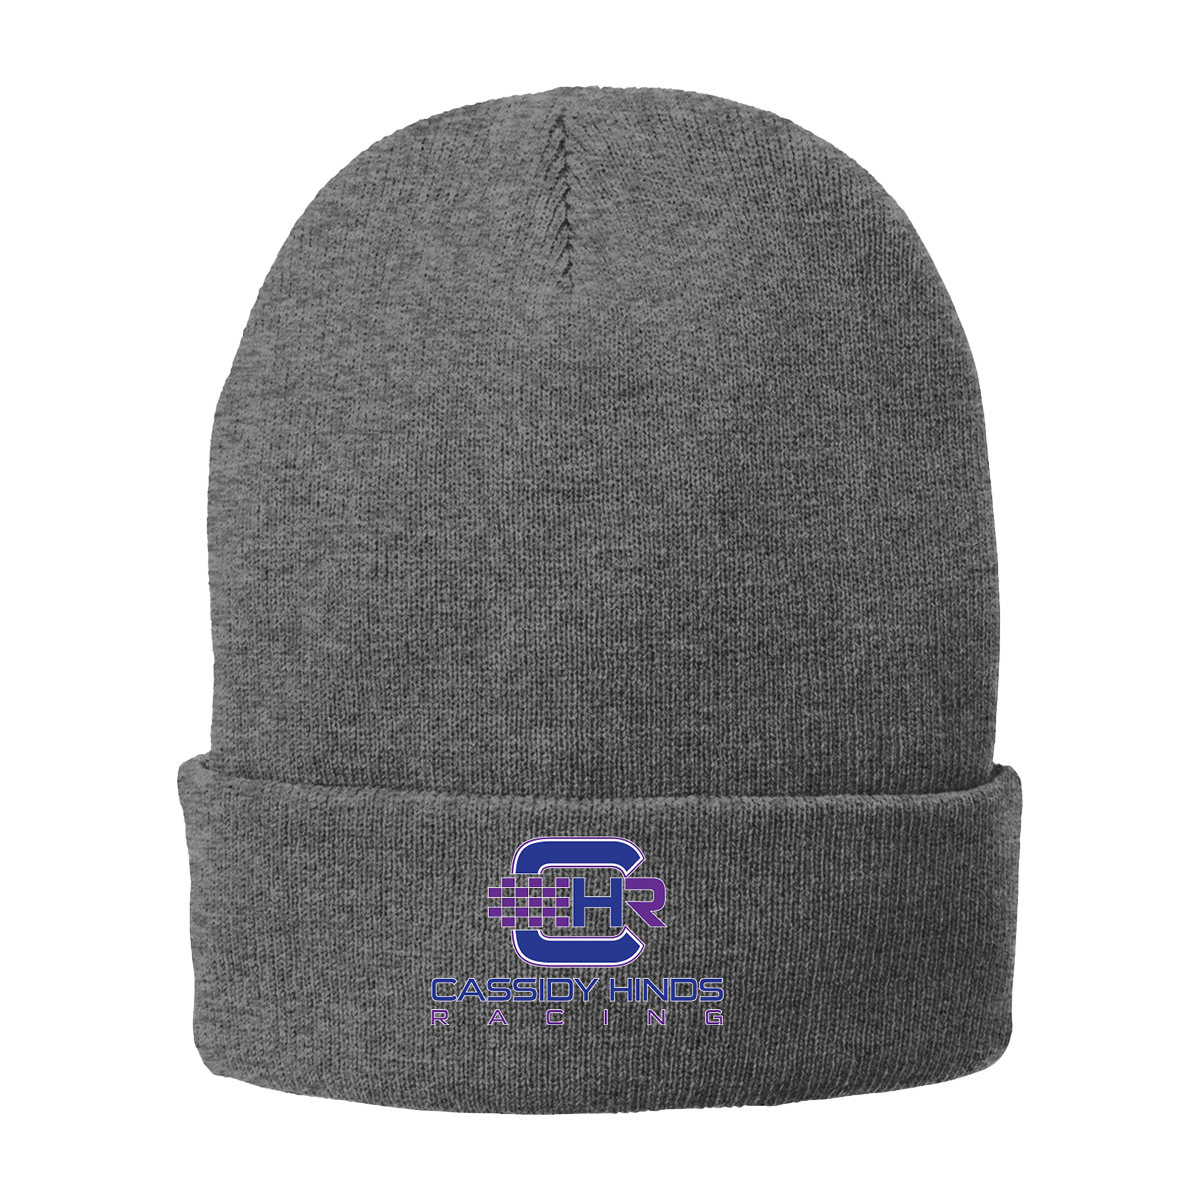 Cassidy Hinds Port & Company Fleece-Lined Knit Cap